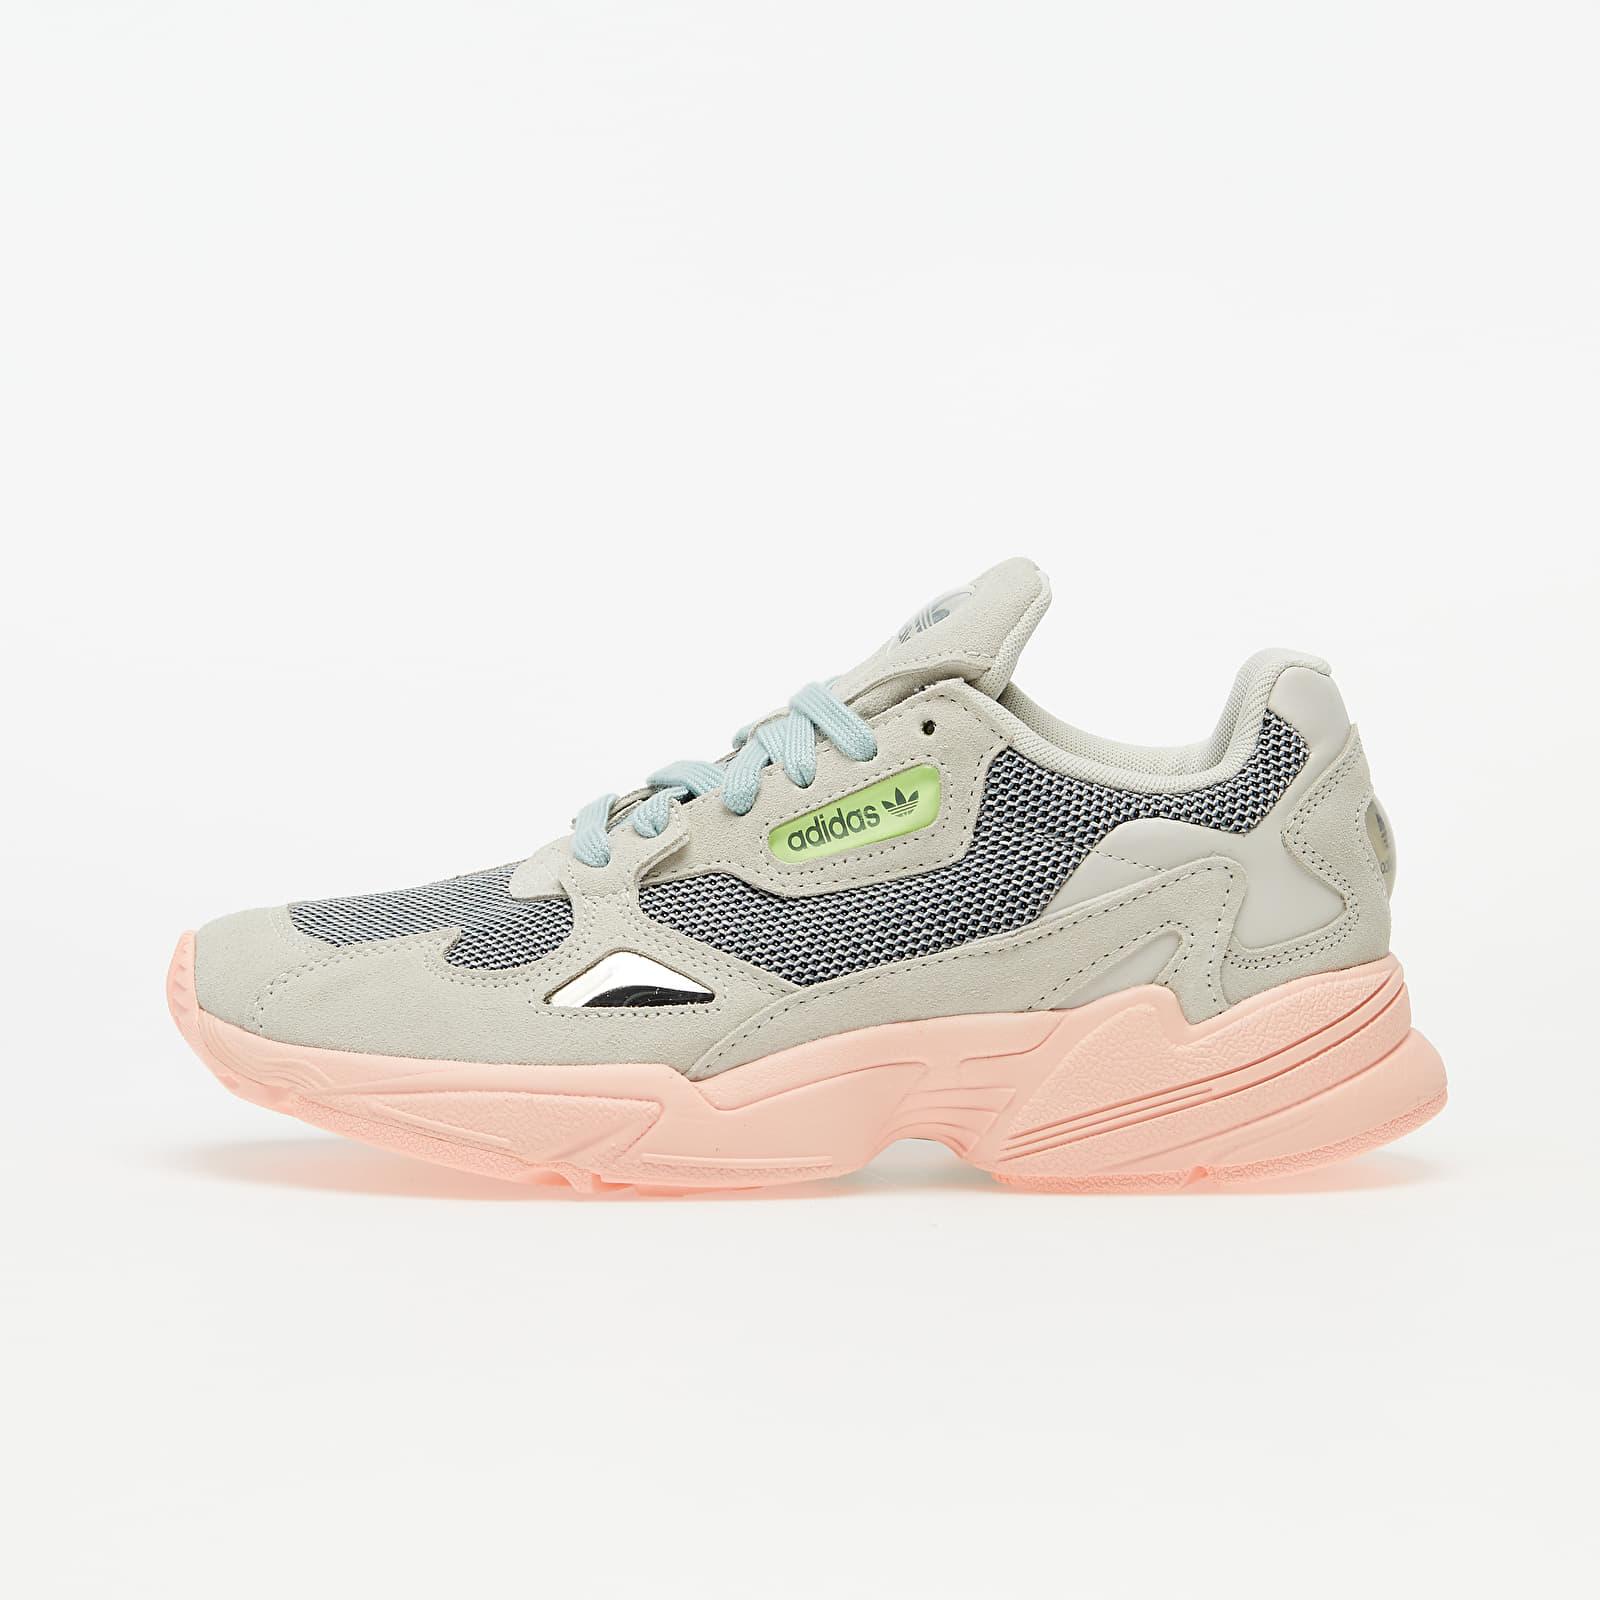 adidas Falcon W Talc/ Haze Coral/ Green Tint EUR 41 1/3